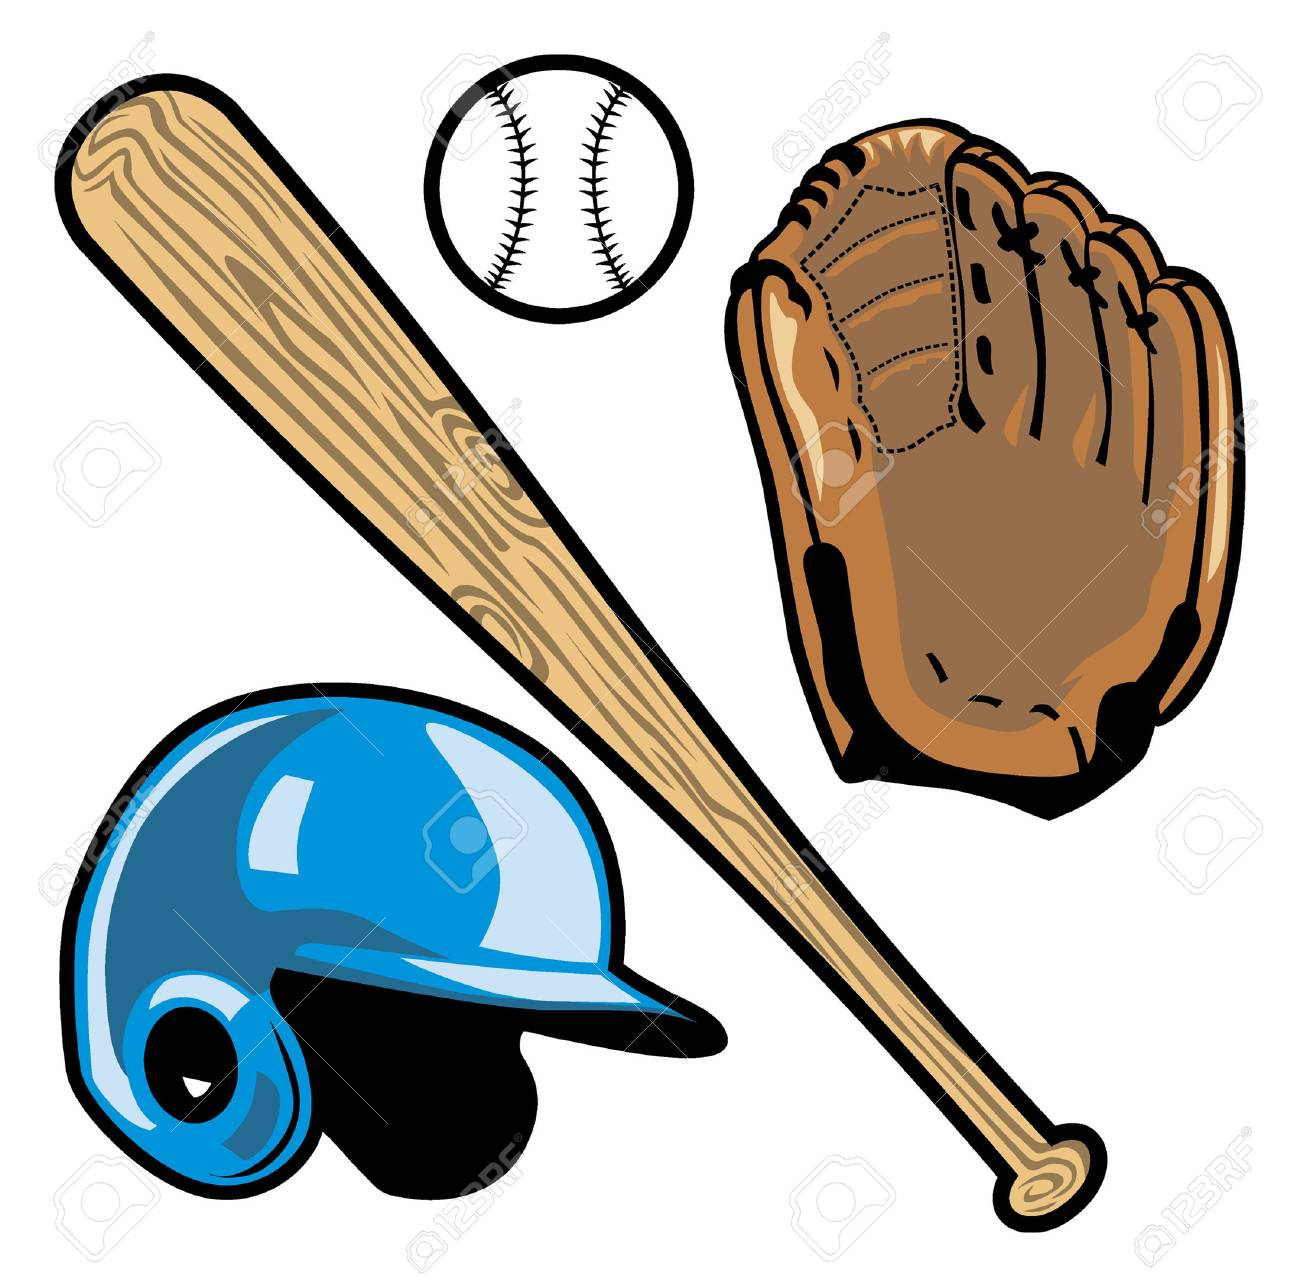 objects of baseball - 92780395